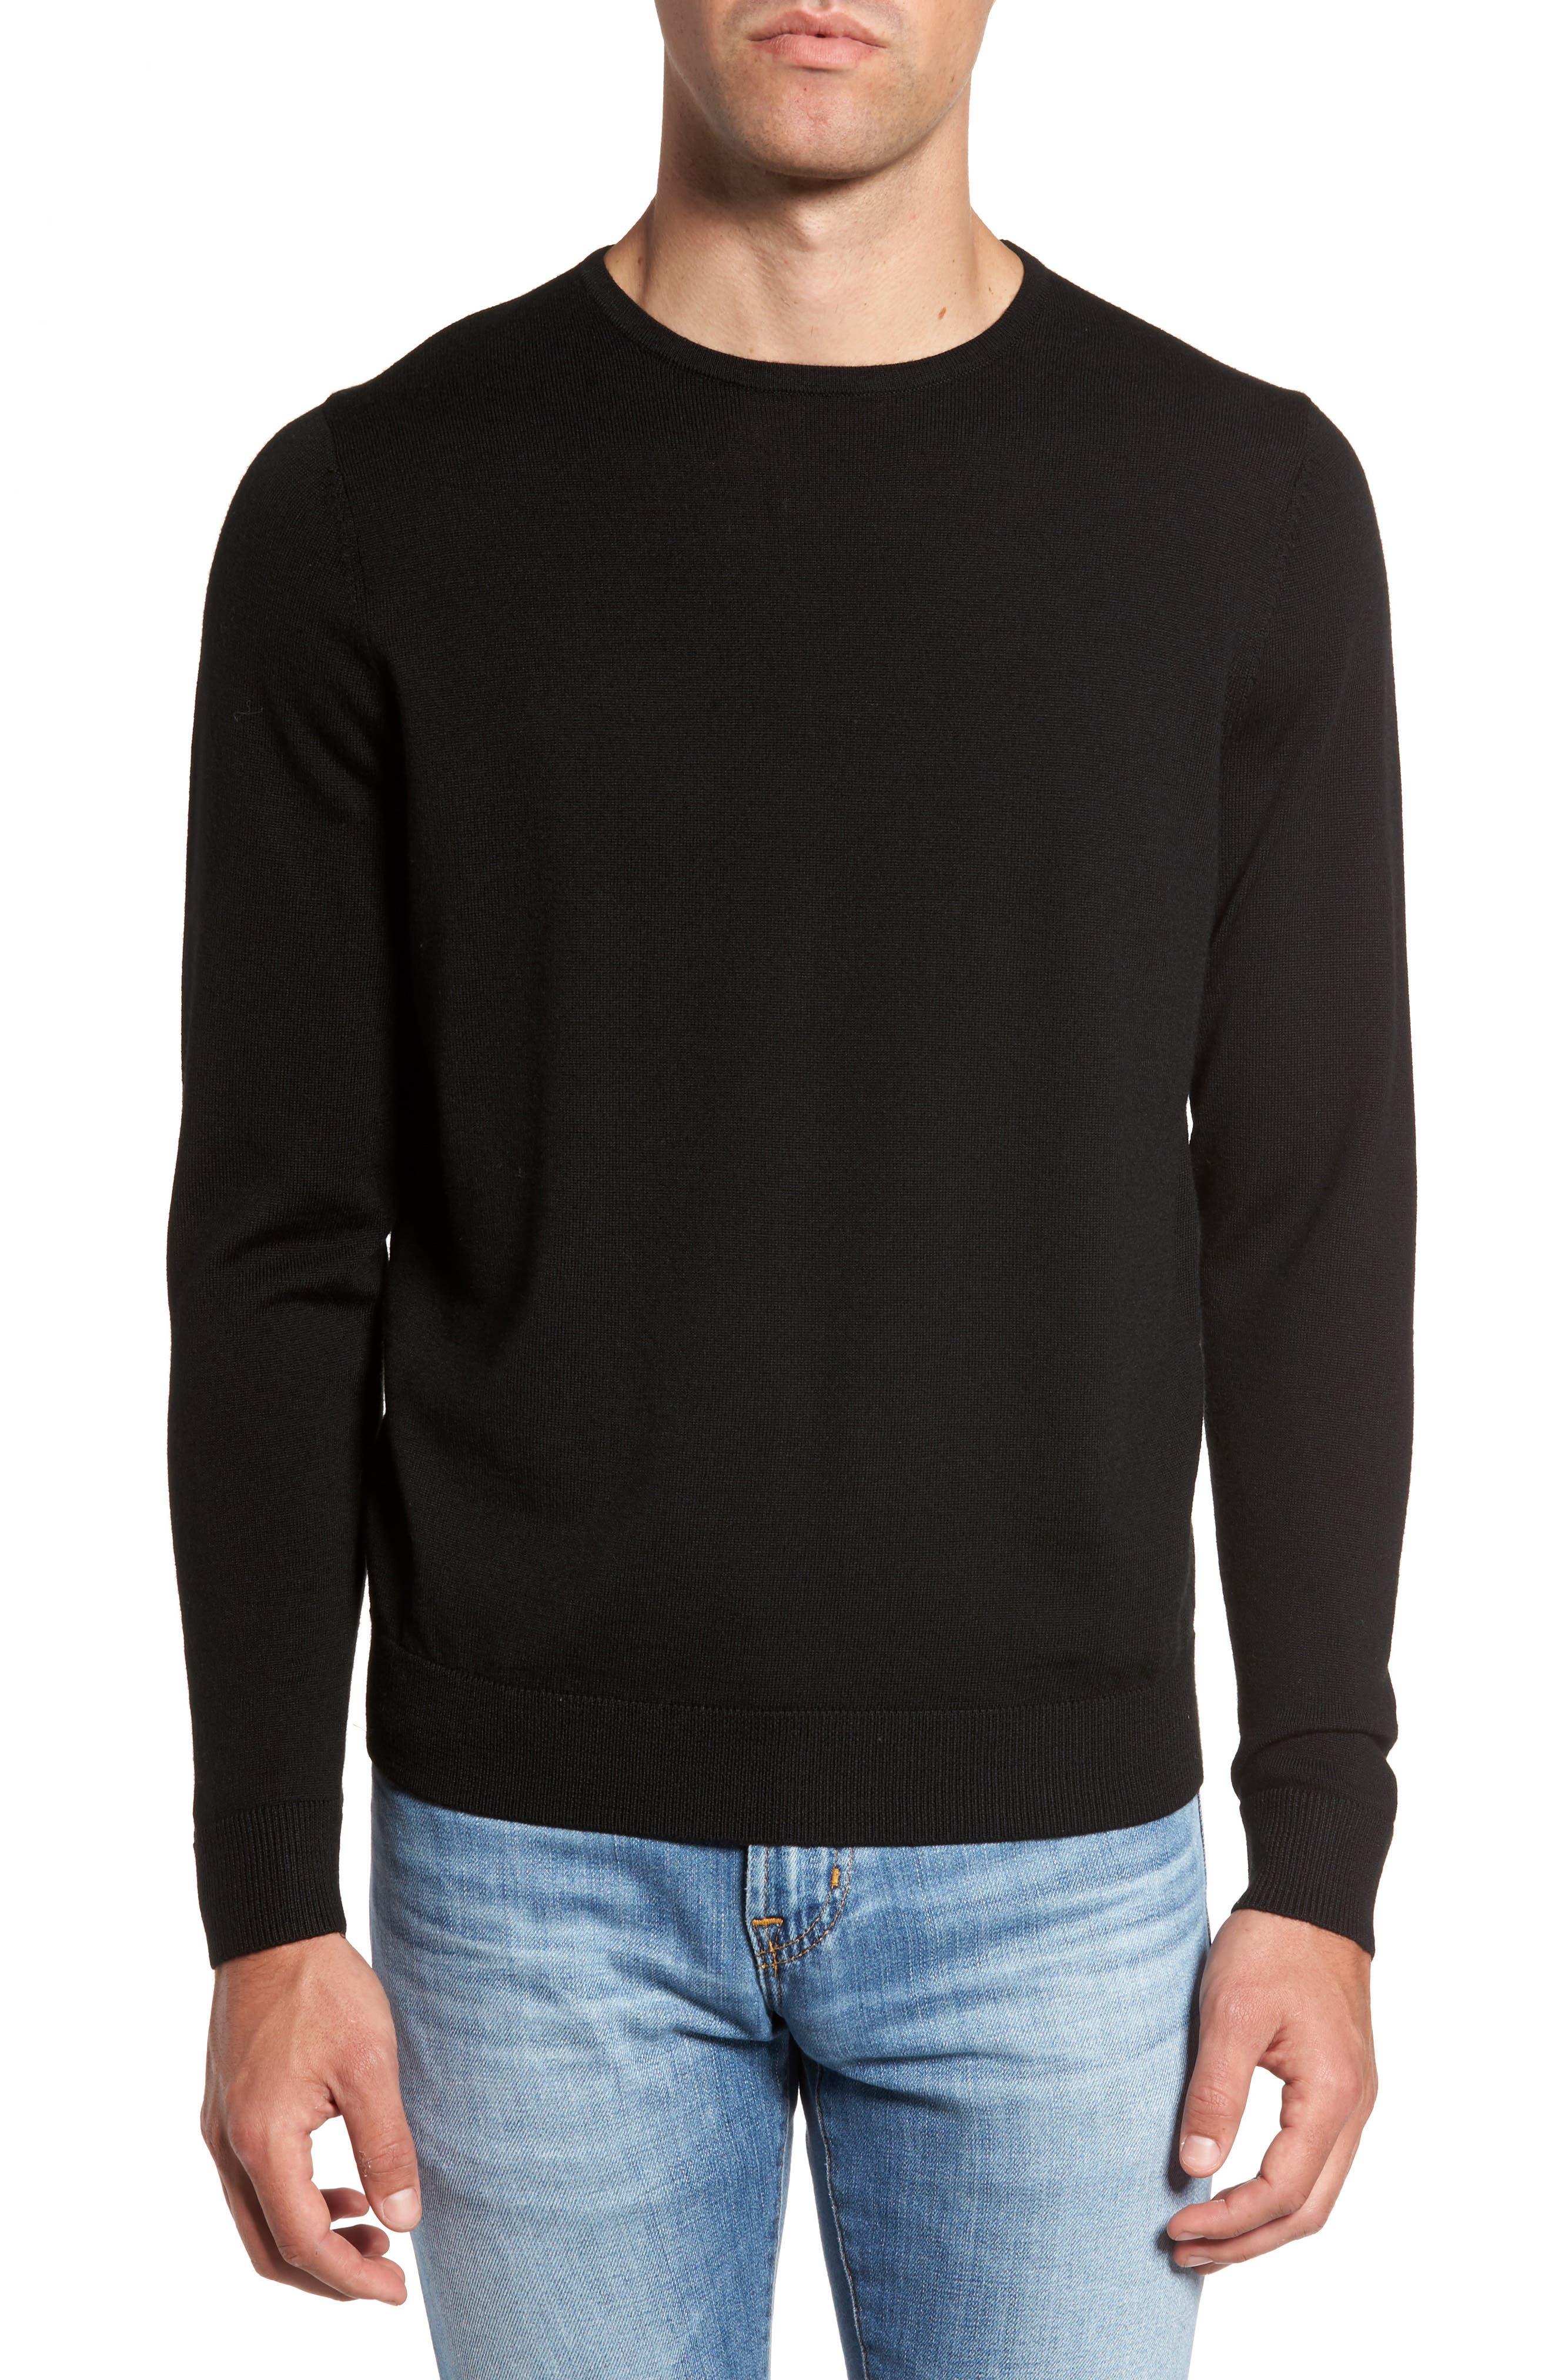 Nordstrom Shop Crewneck Merino Wool Sweater, Black